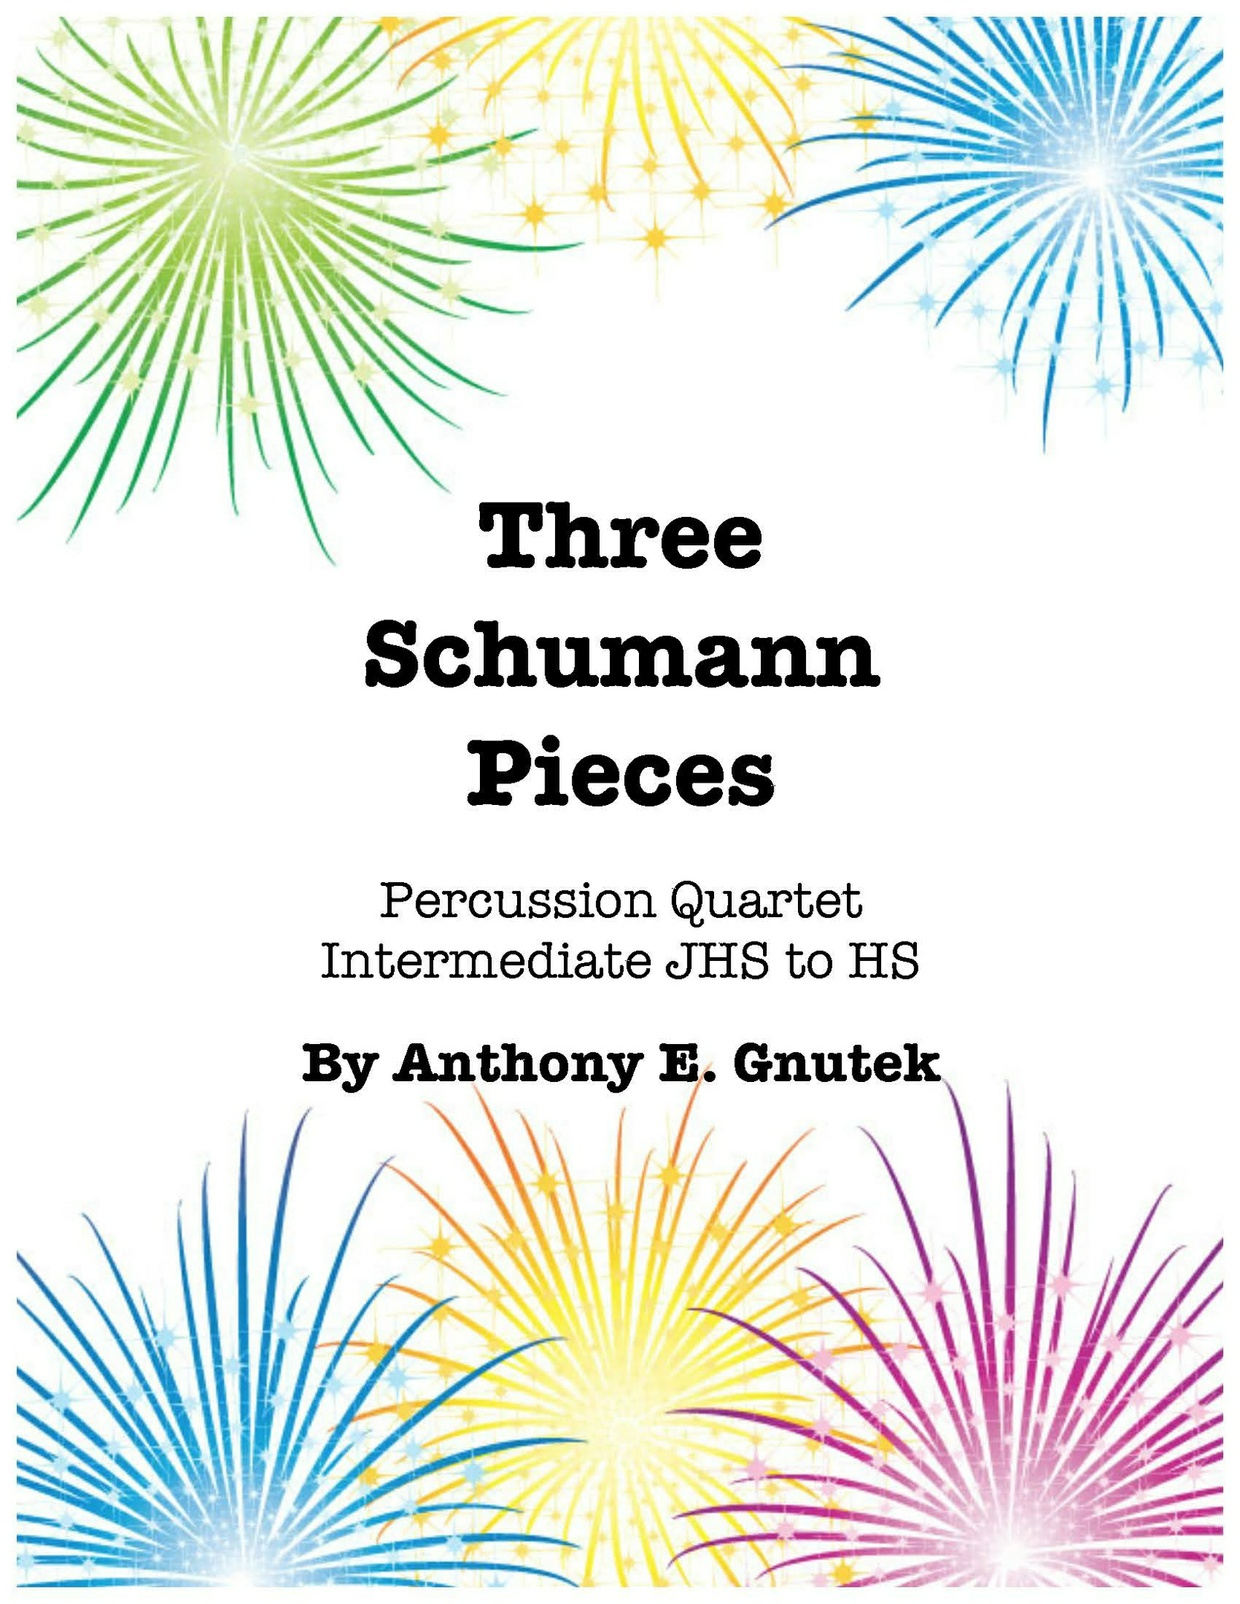 Three Schumann Pieces Op.68, No.10